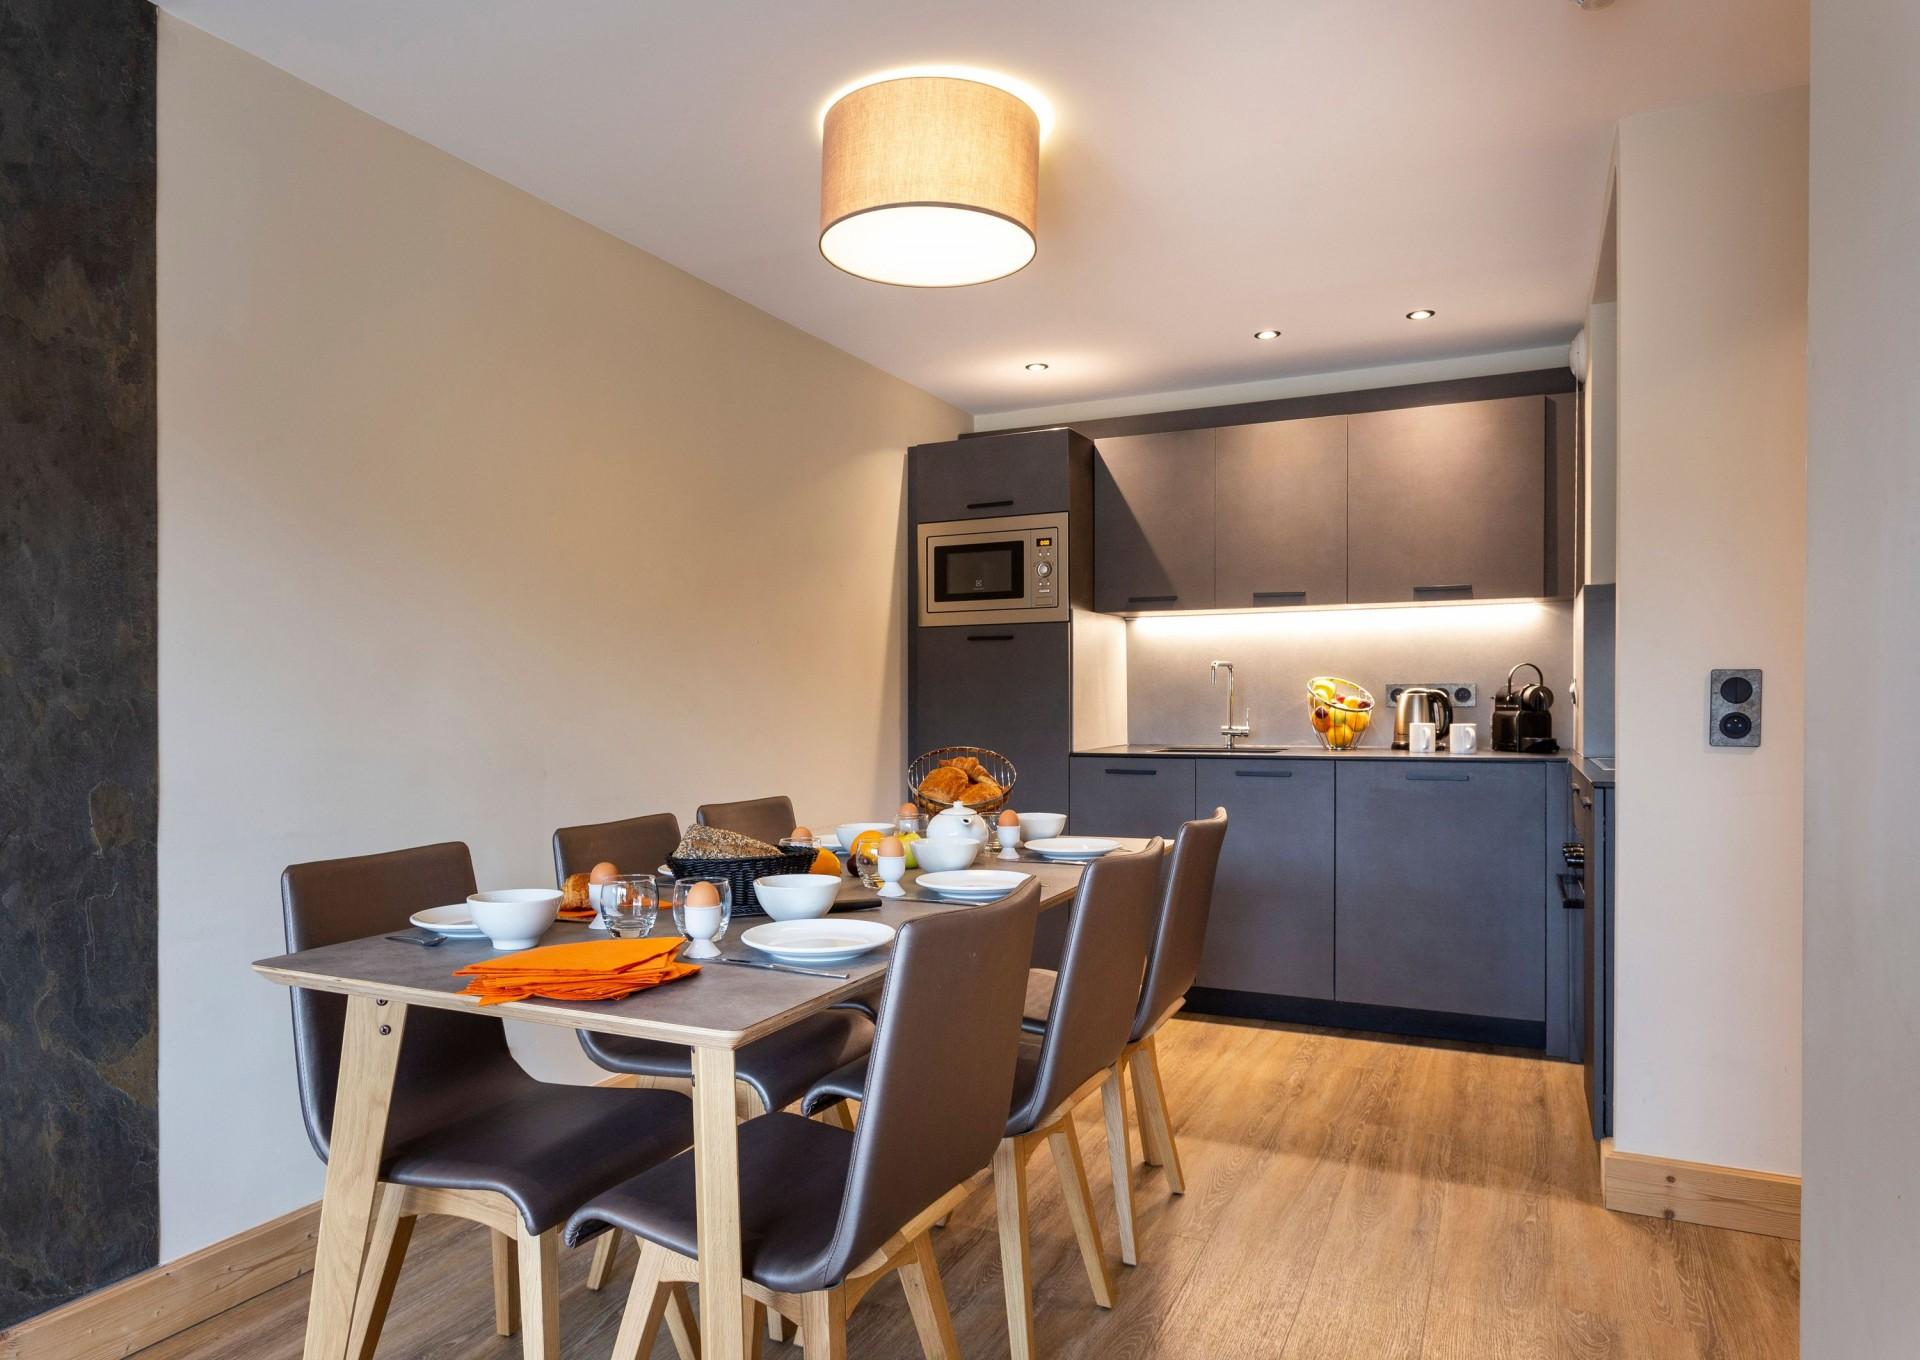 Alpe D'Huez Location Appartement Luxe Amari Salle A Manger